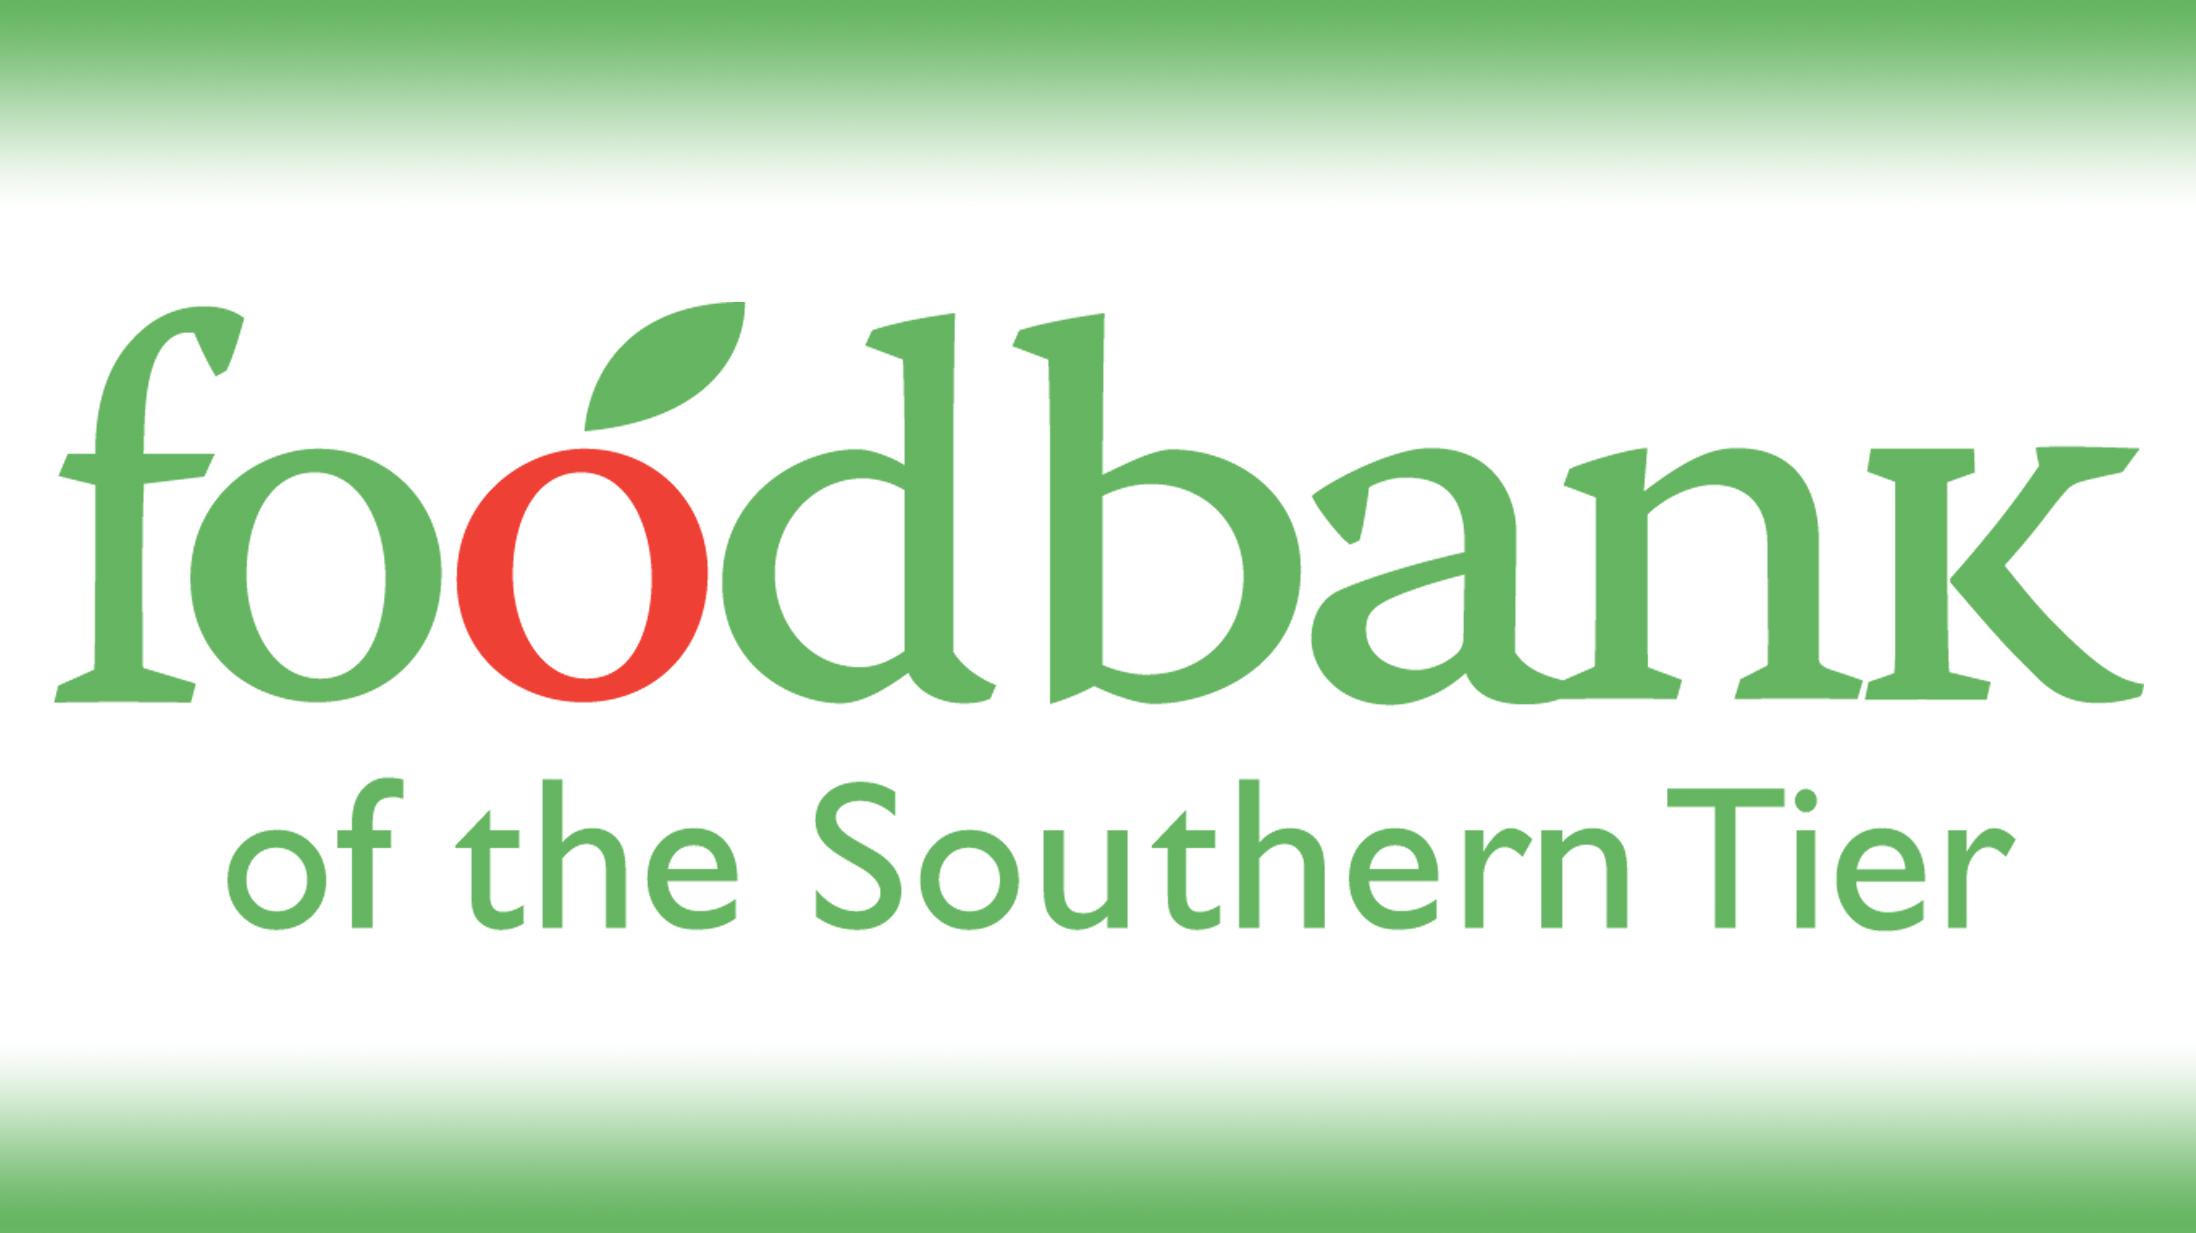 Food Bank OTST 09212015_1458519486450.jpg